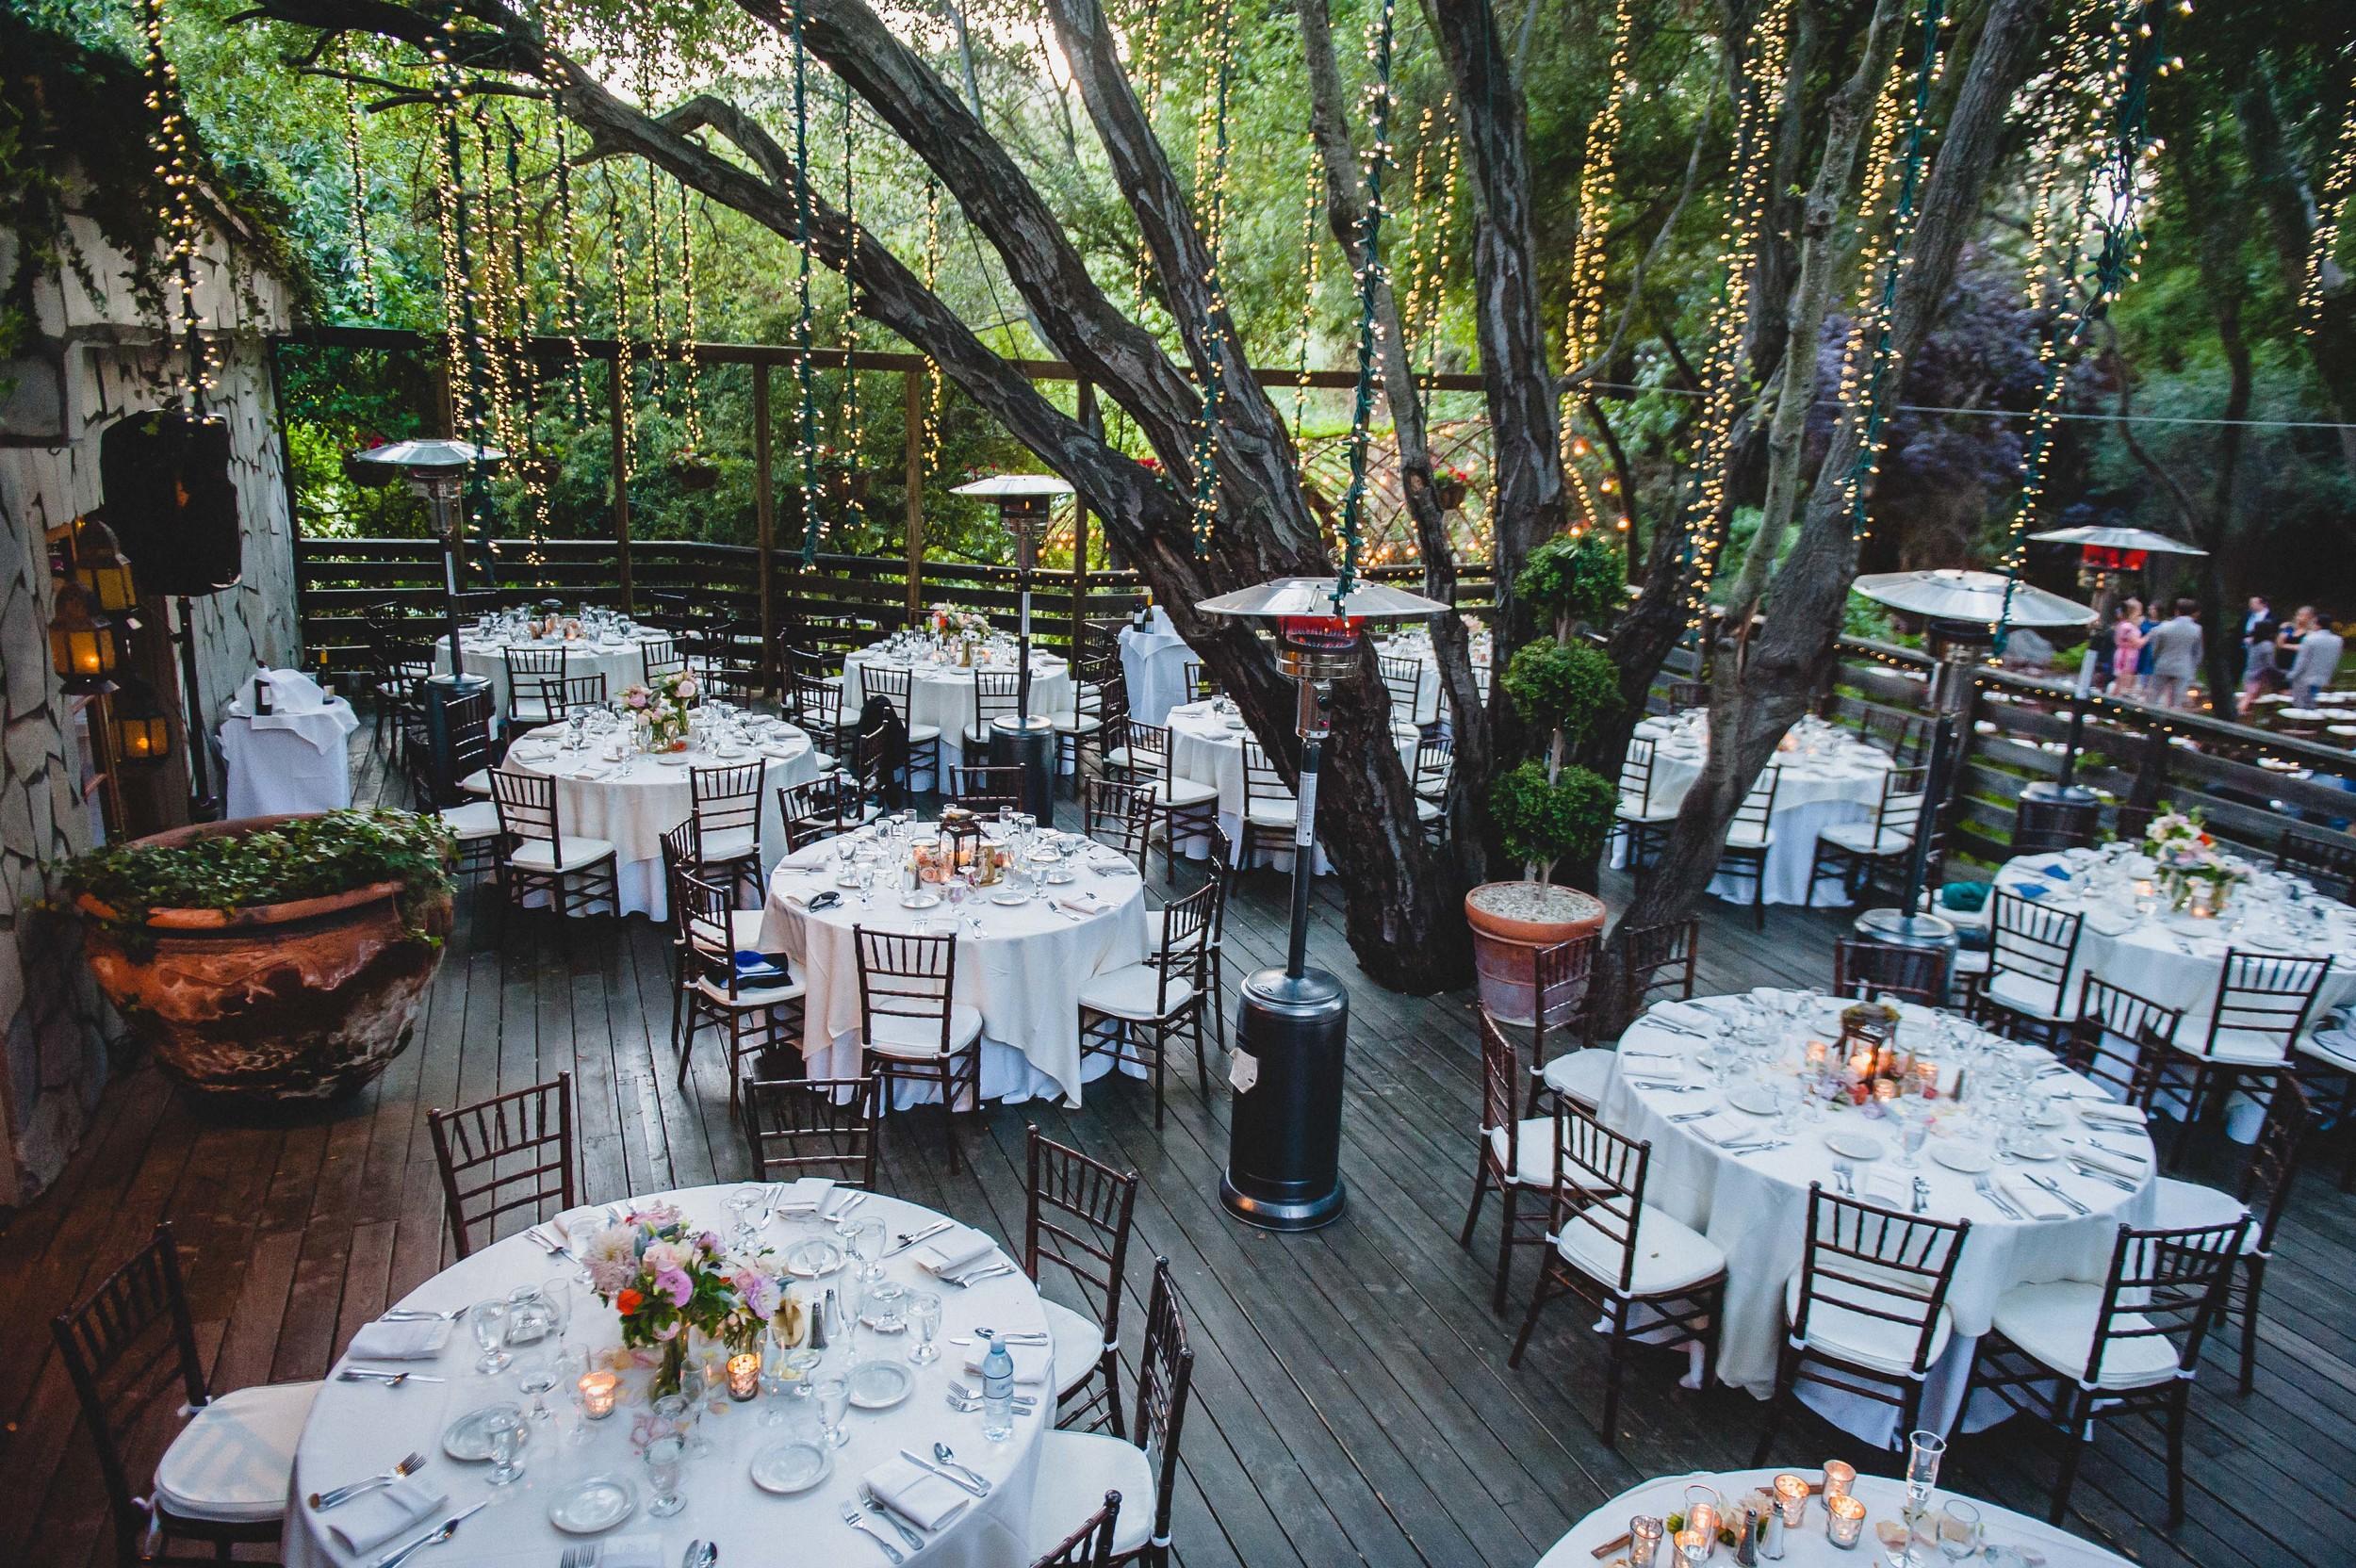 los angeles malibe cafe calamigos ranch wedding phtoographer edward lai-60.jpg